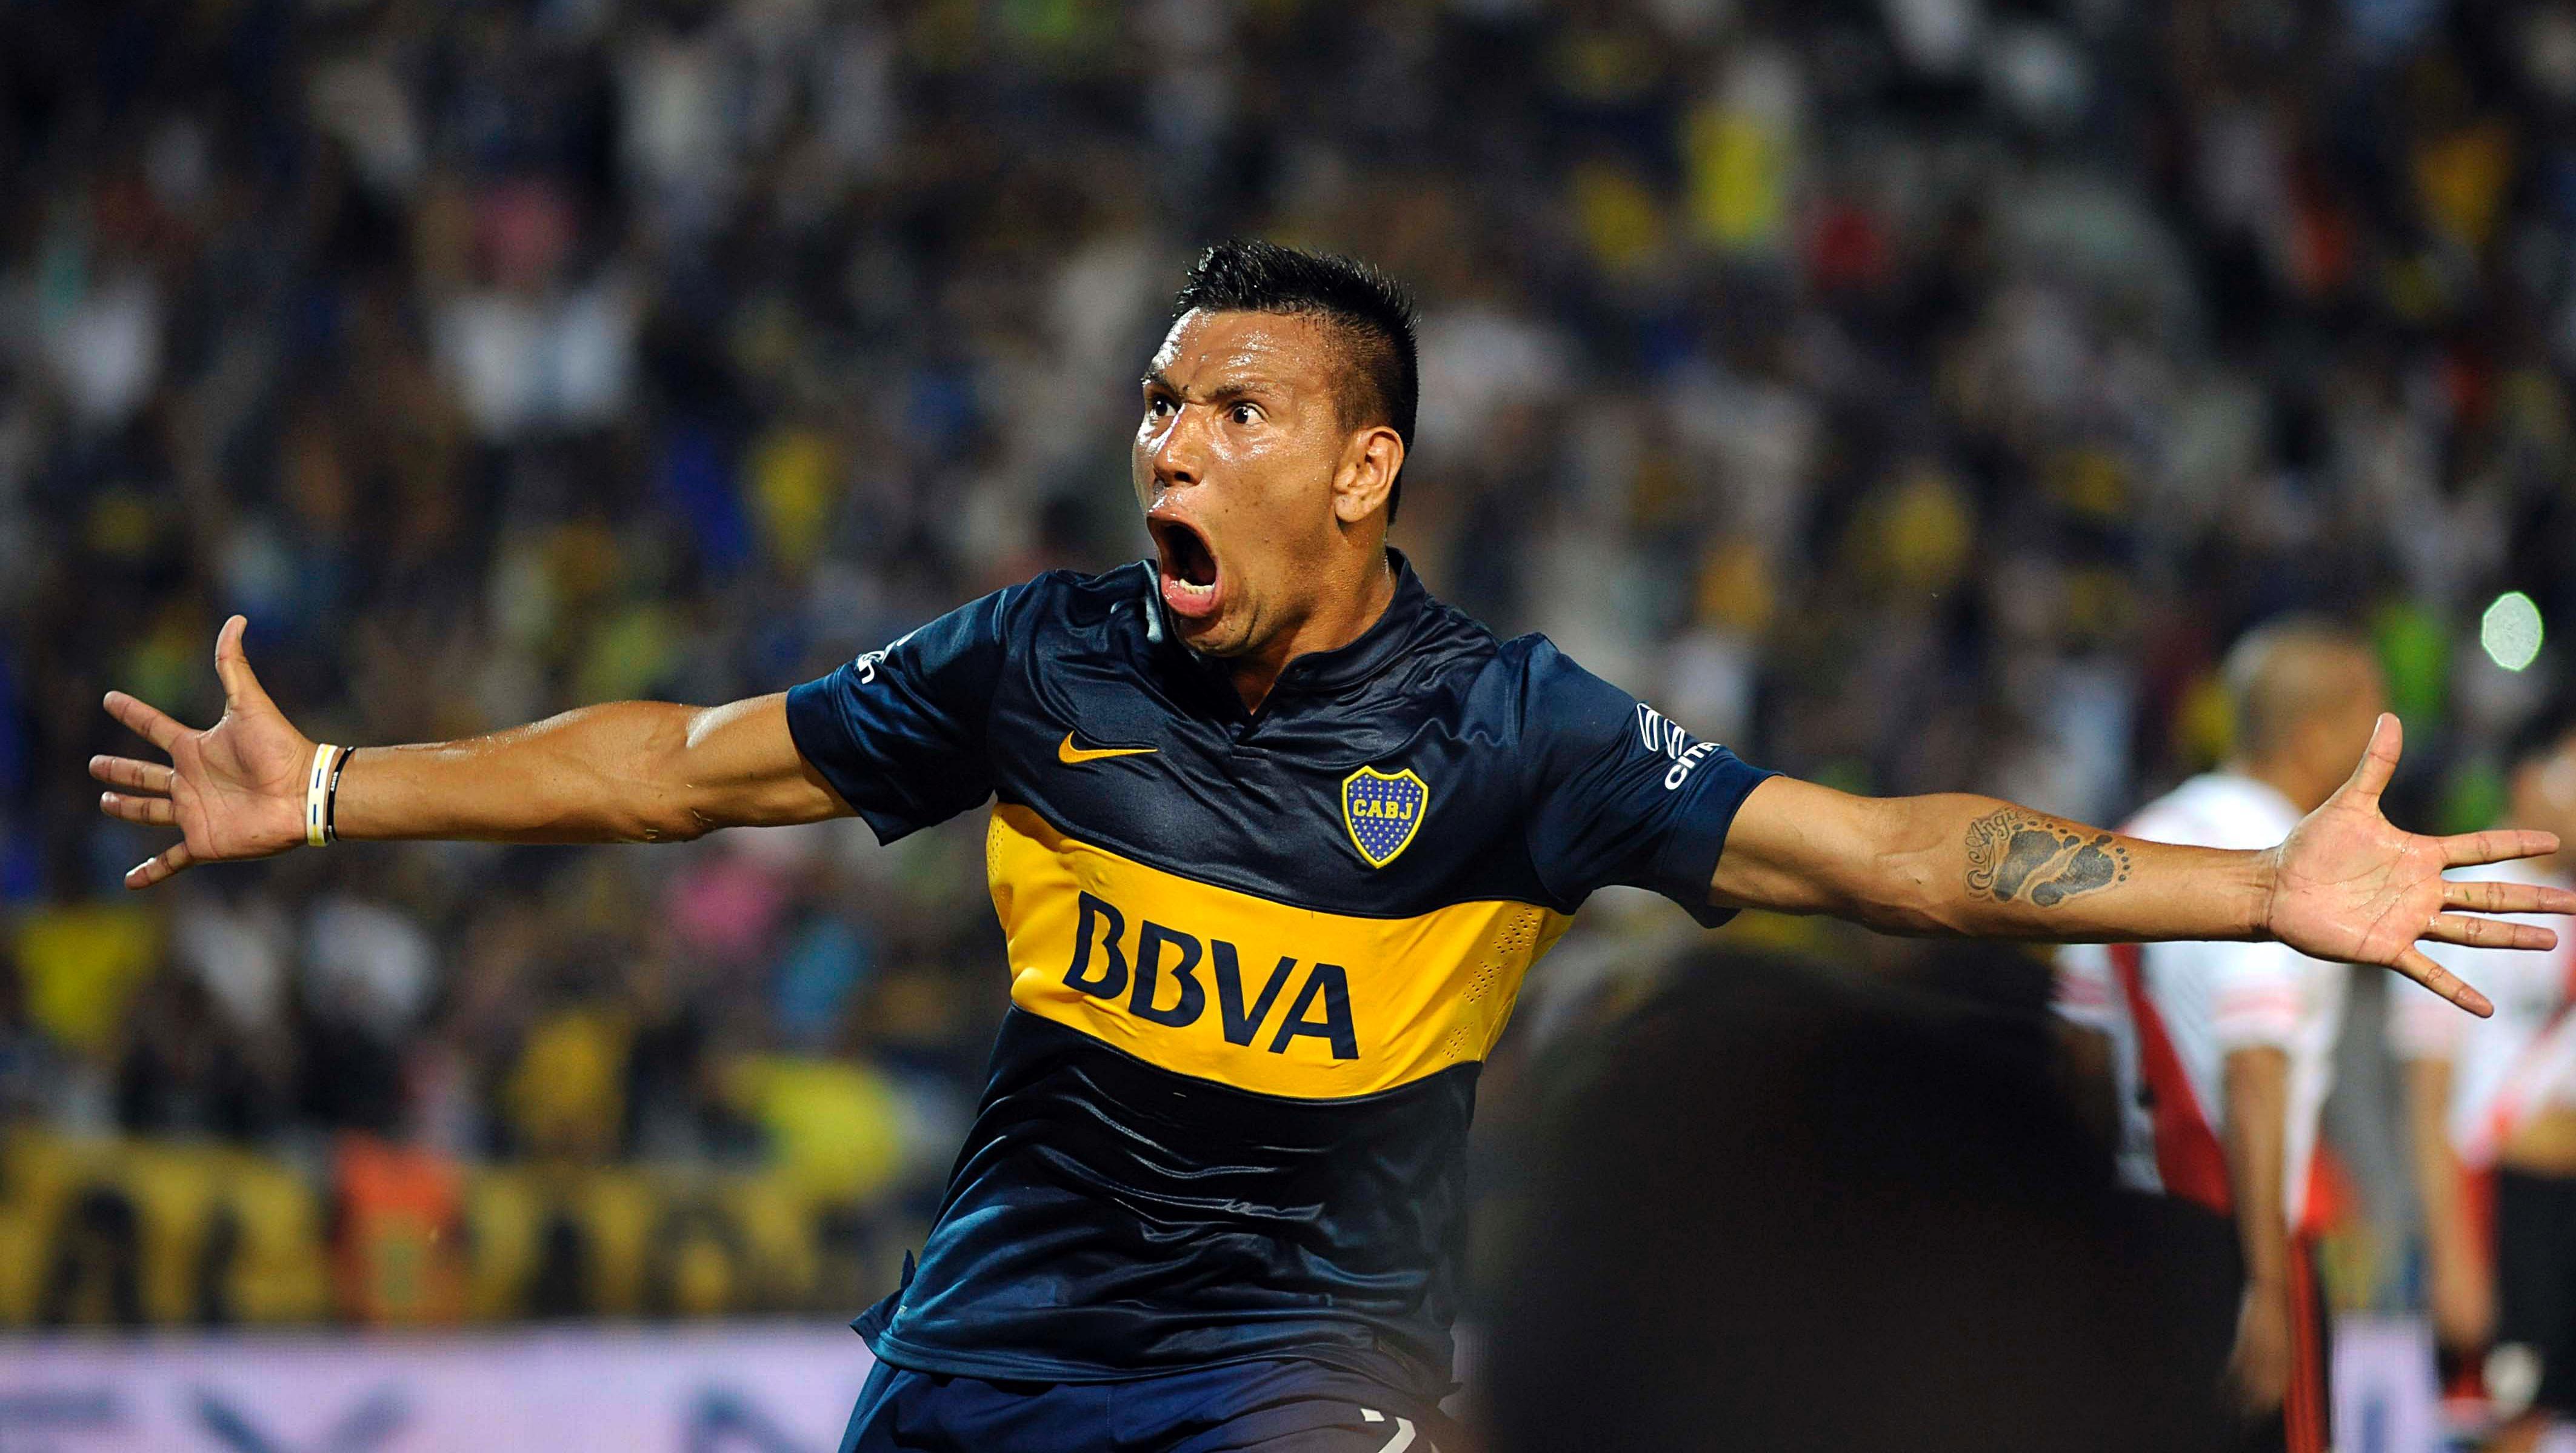 Resultado de imagen para Andres Chavez Boca